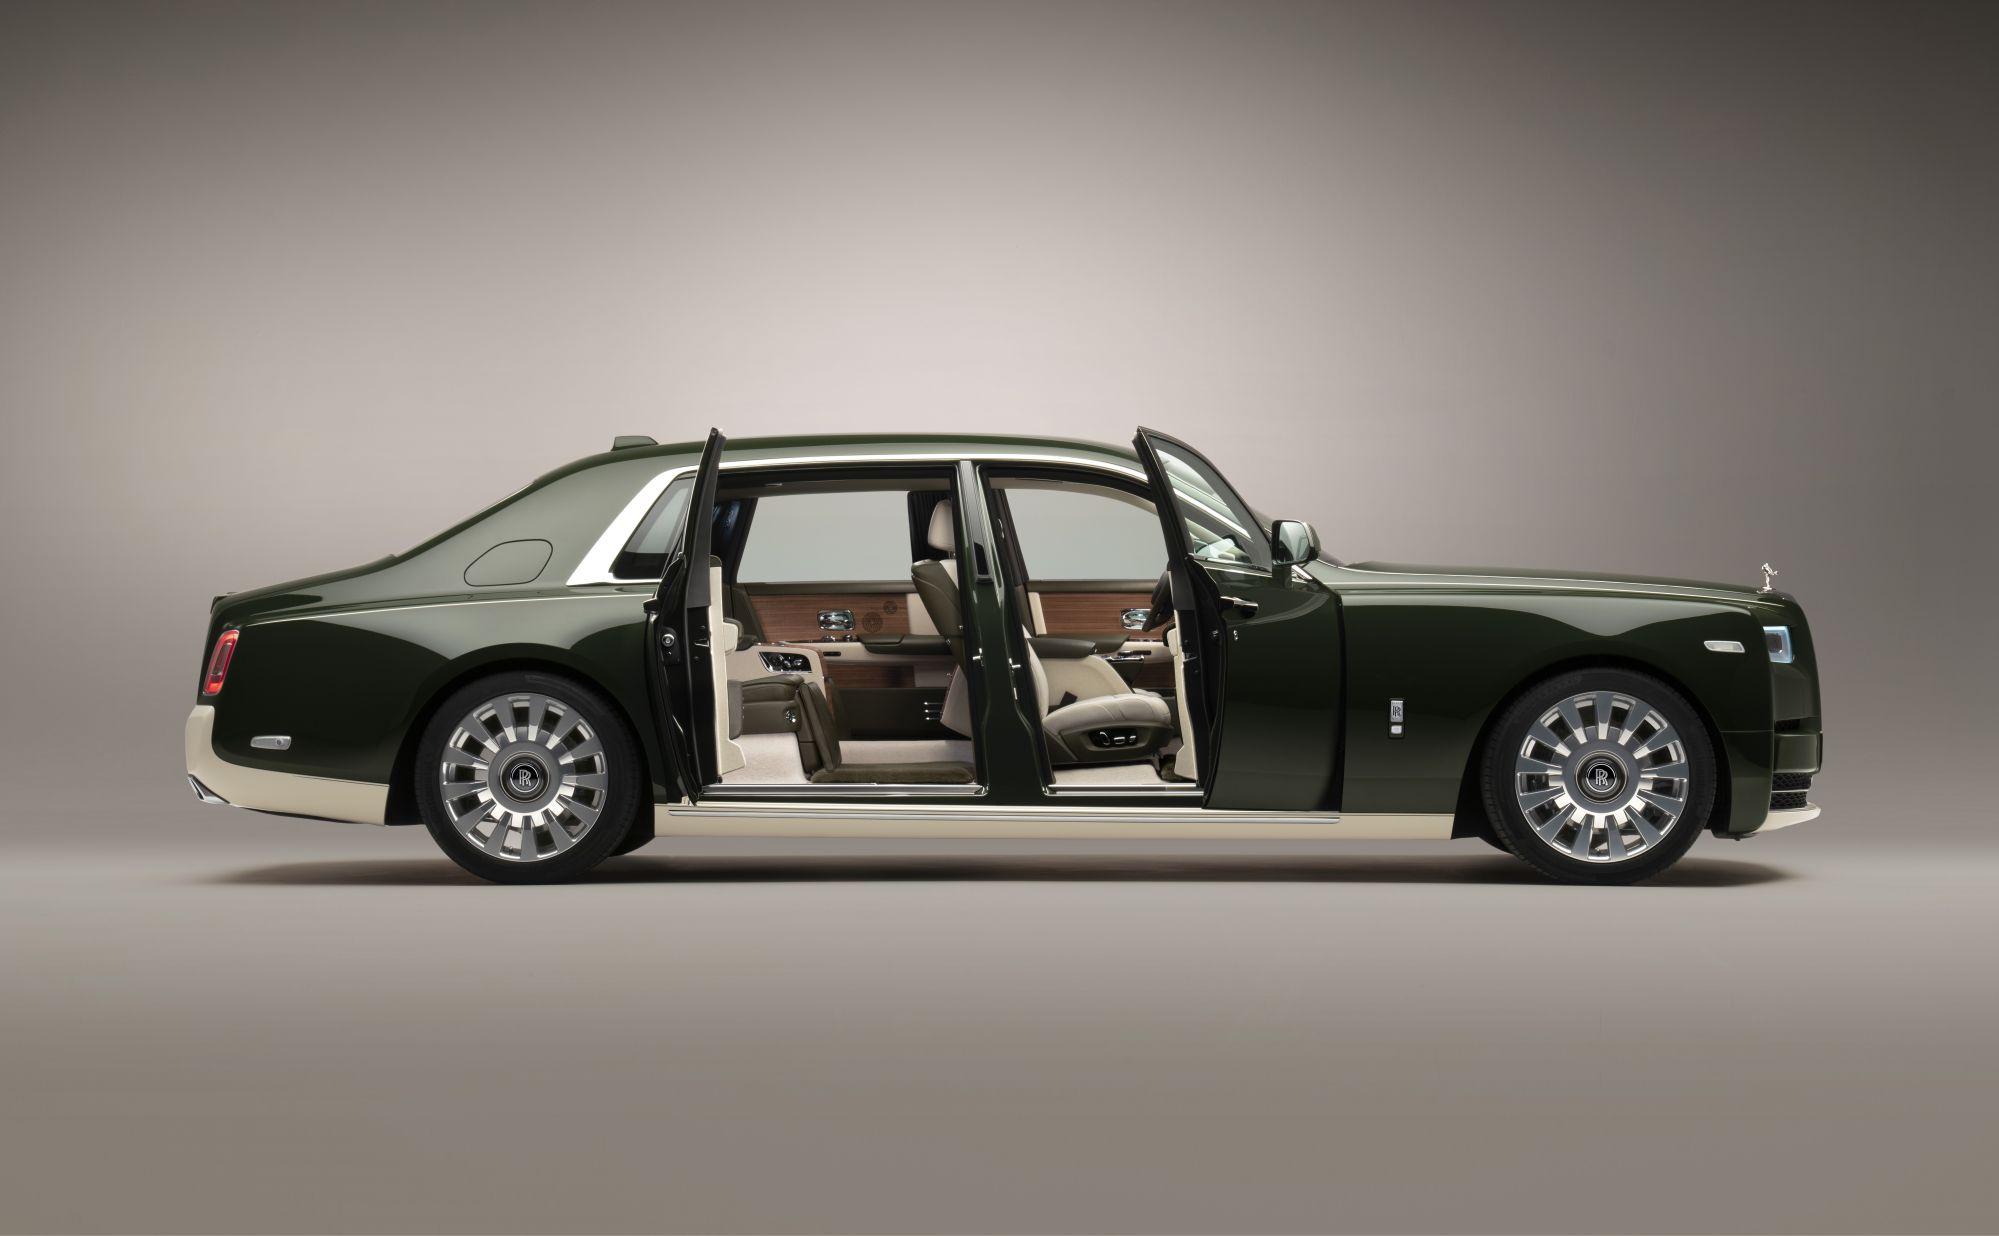 A Japanese Billionaire is the New Owner of a Custom-Made Hermès x Rolls-Royce Phantom